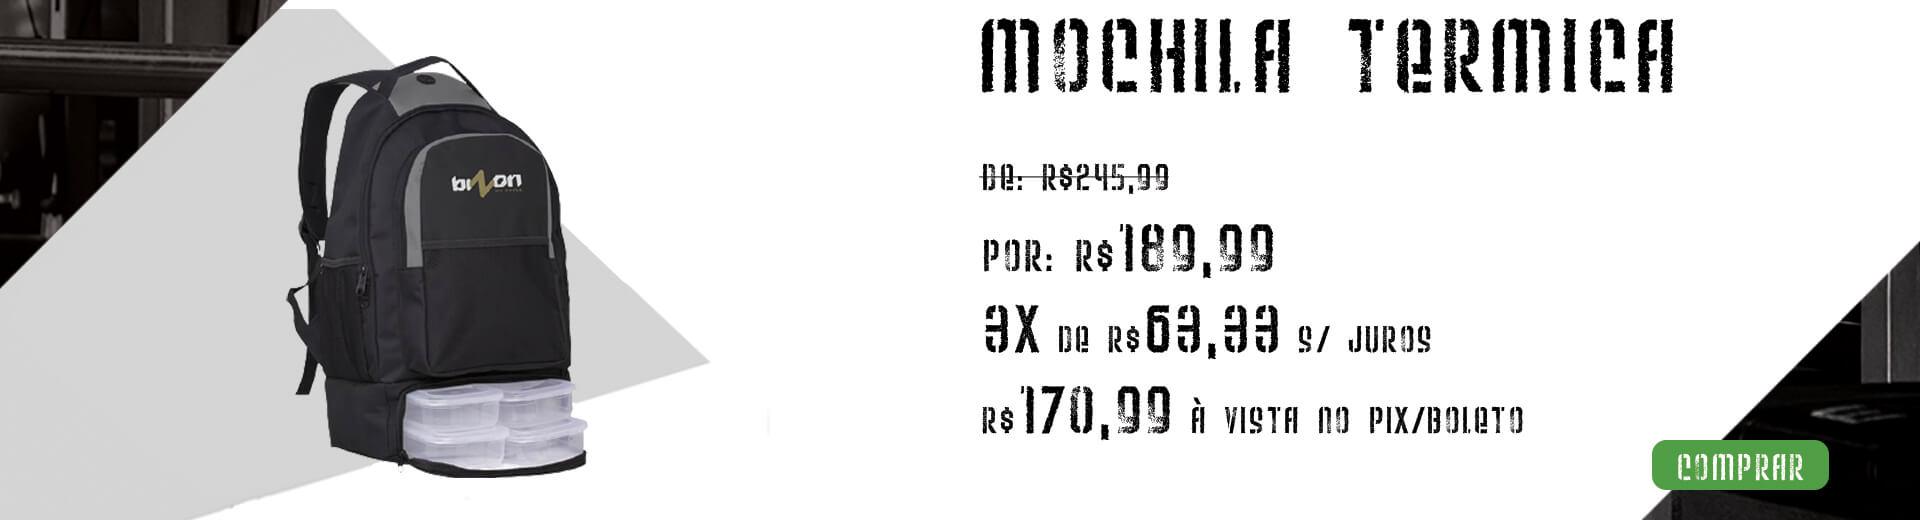 Mochila Térmica Fitness